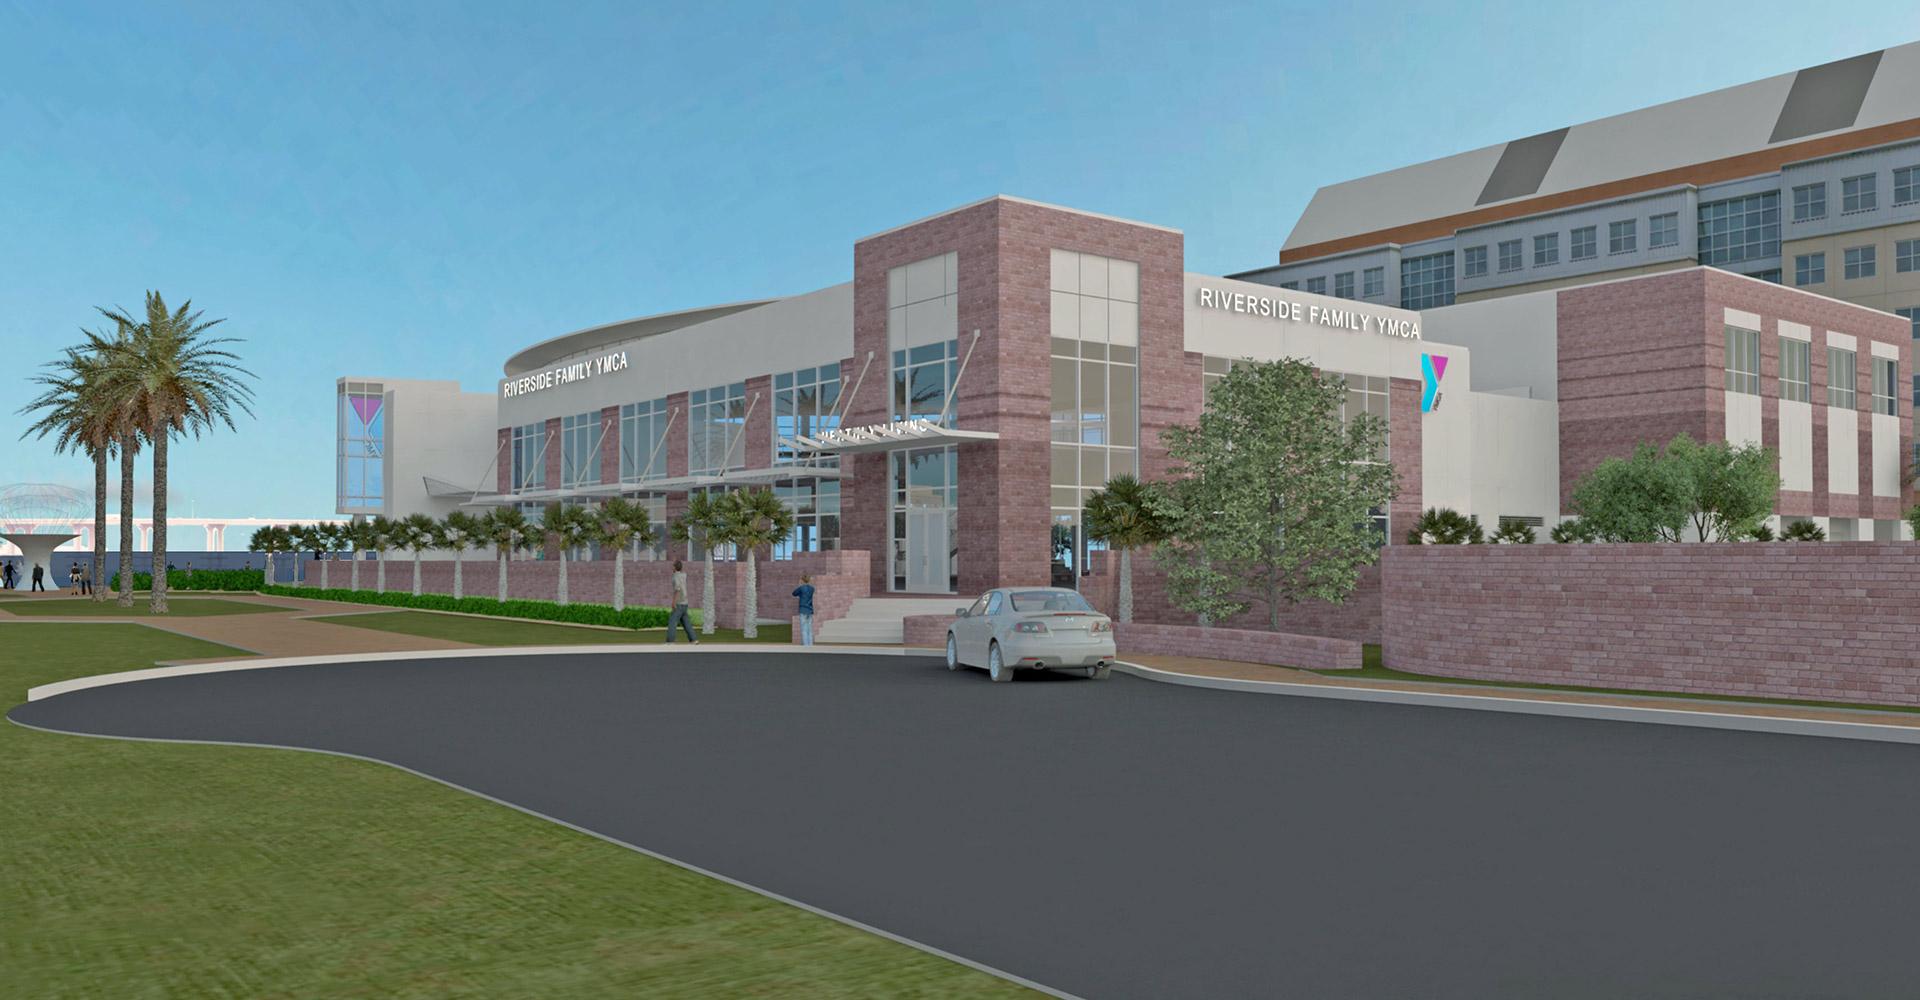 Riverside YMCA rendering exterior closeup of entrance.